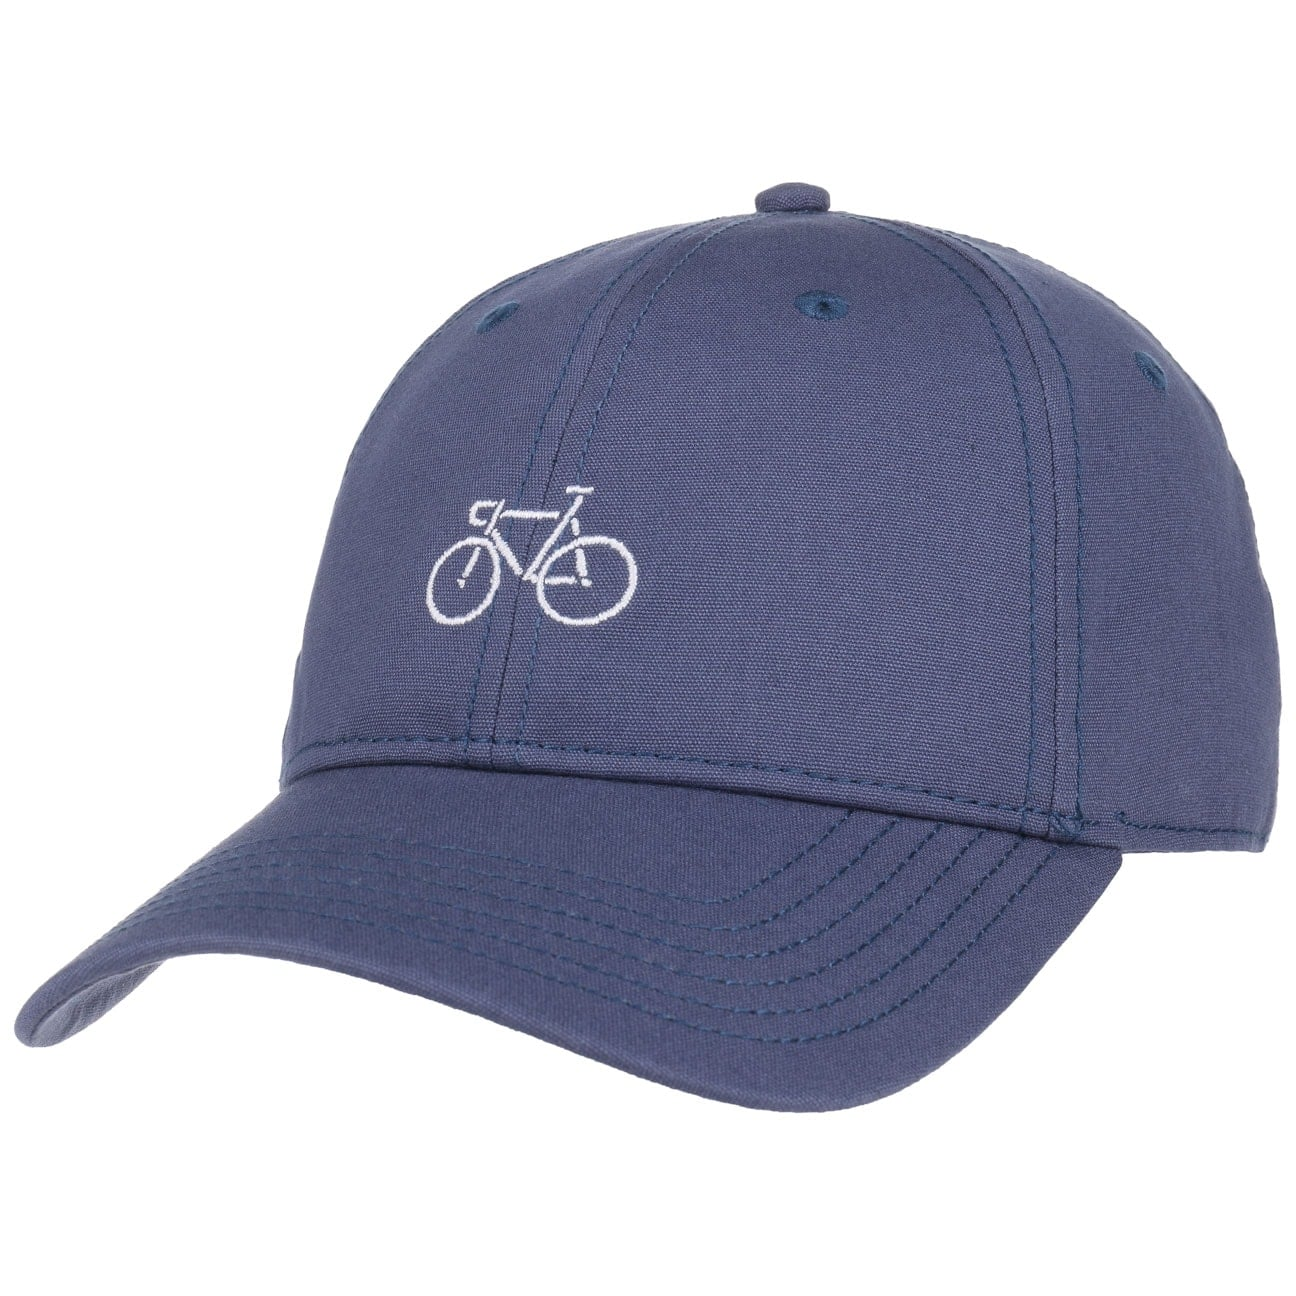 Gorra Picto Bike by dedicated